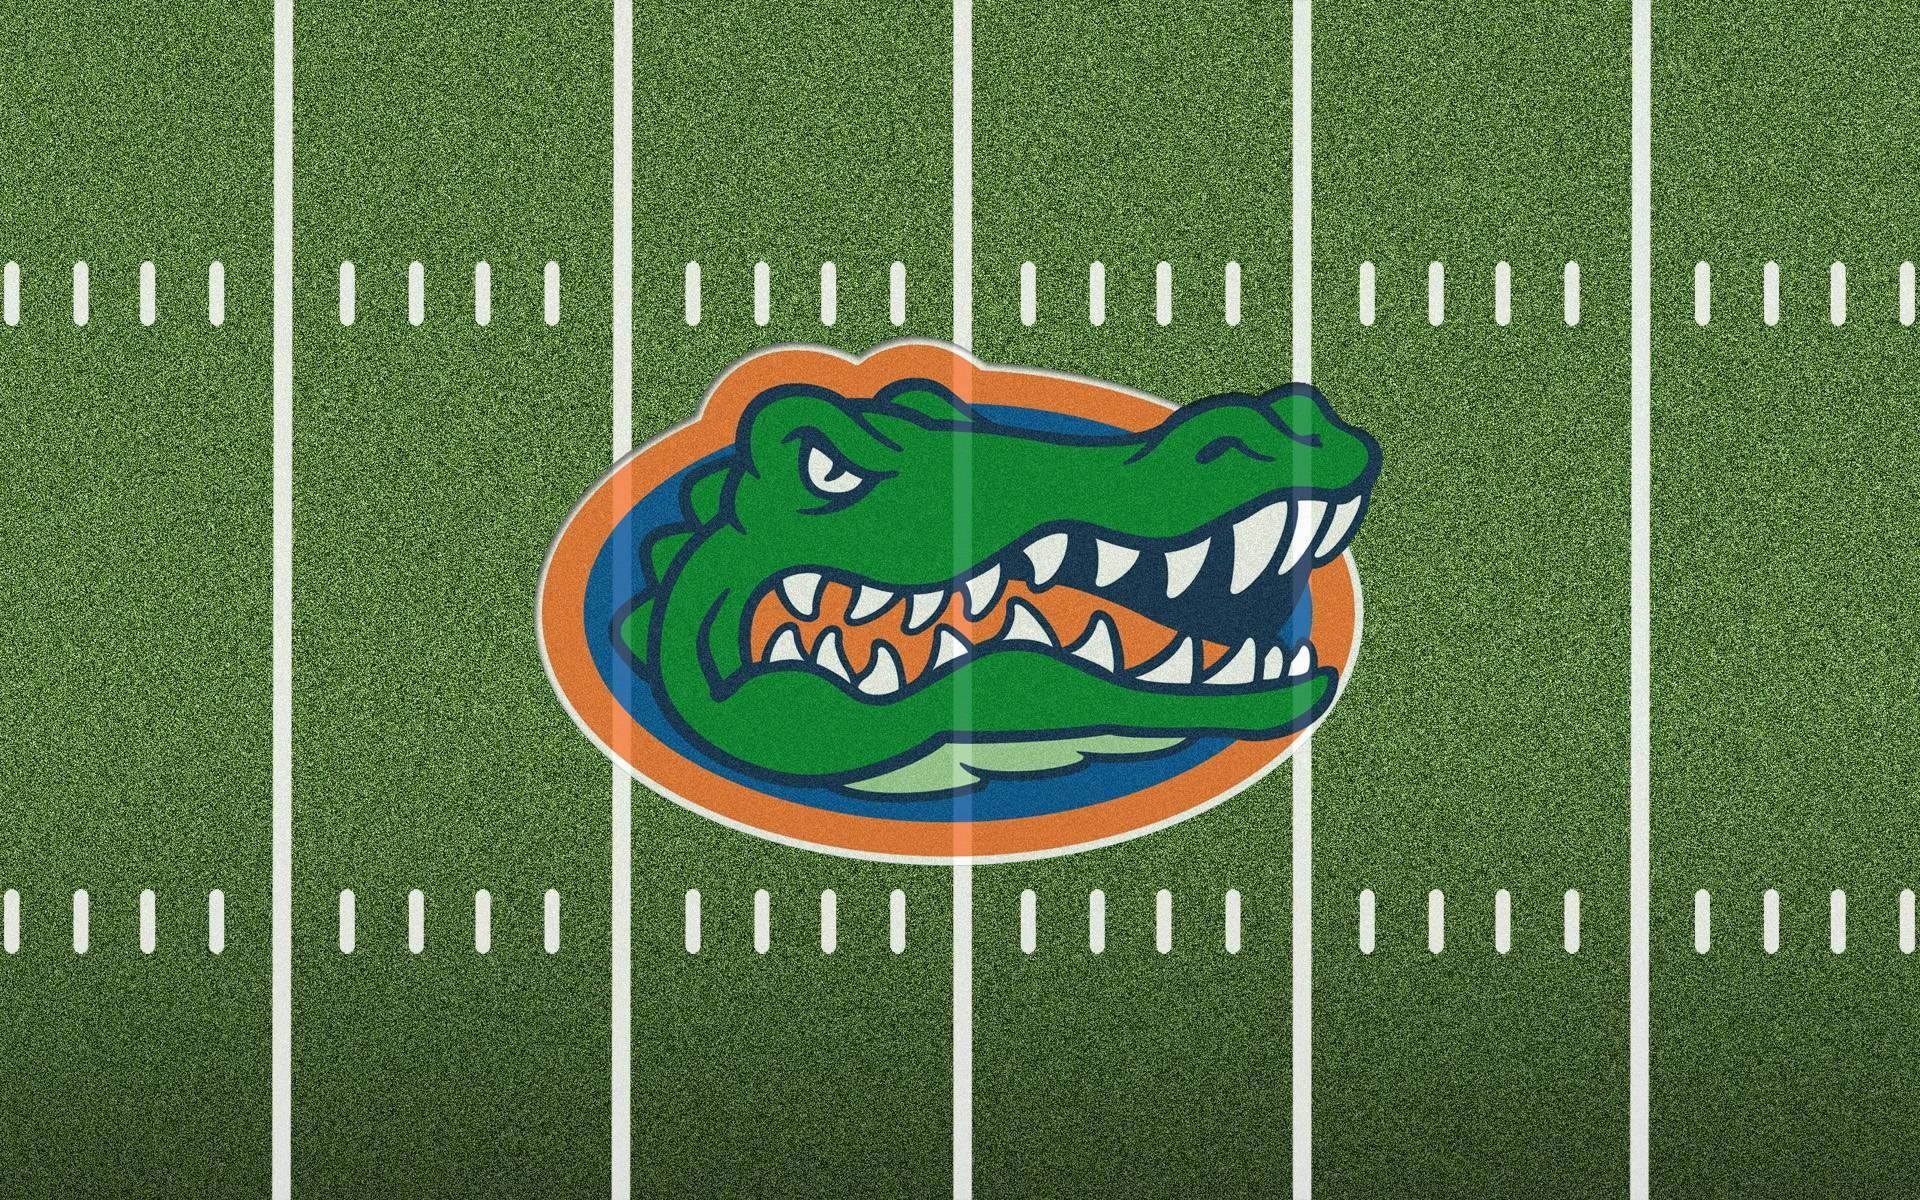 American Football Field Backgrounds Florida Gators Football .